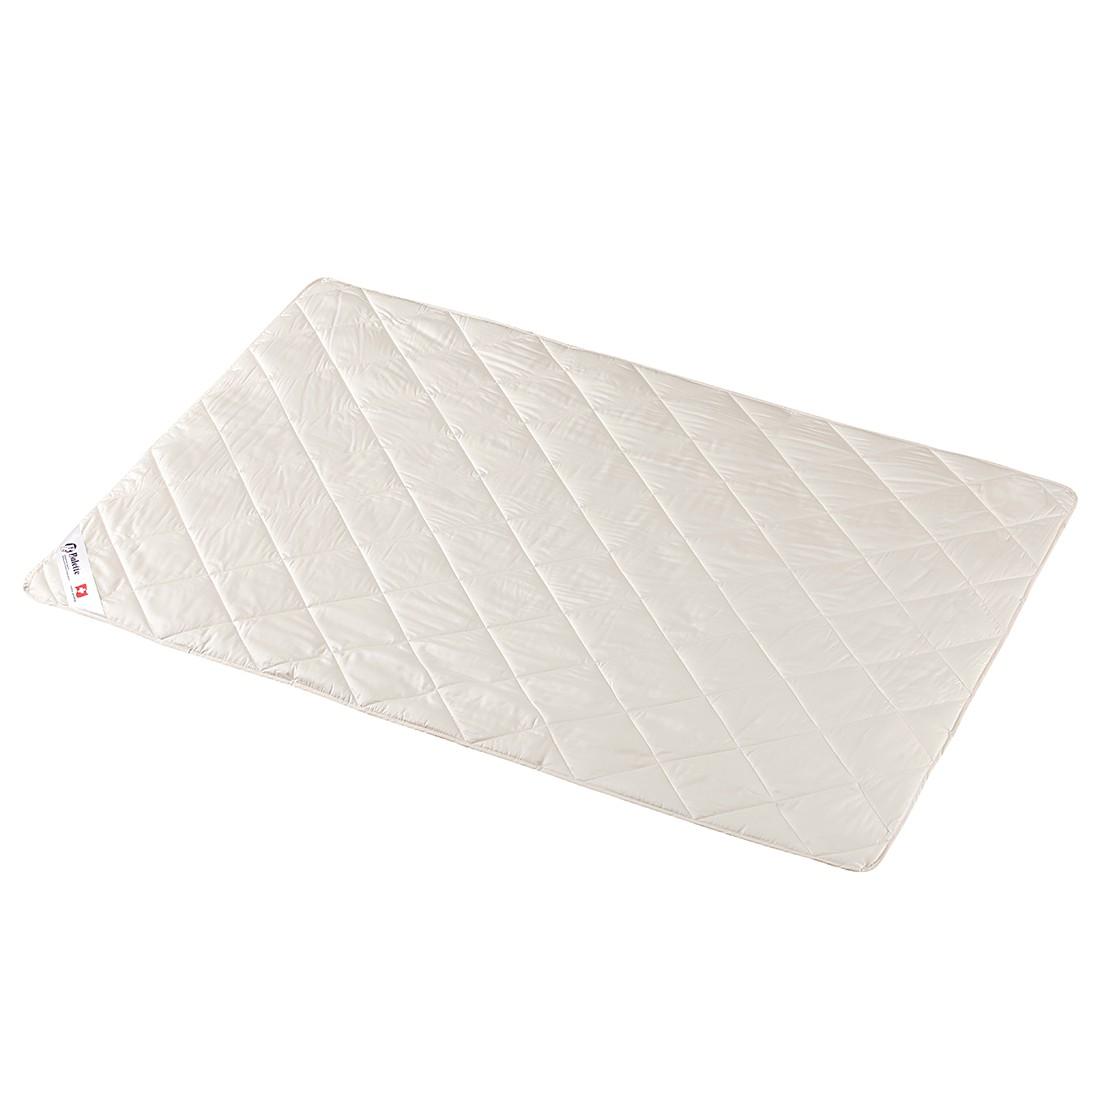 Bettdecke Easy Comfort Tencel – 135 x 200 cm – Sommerdecke, Balette kaufen